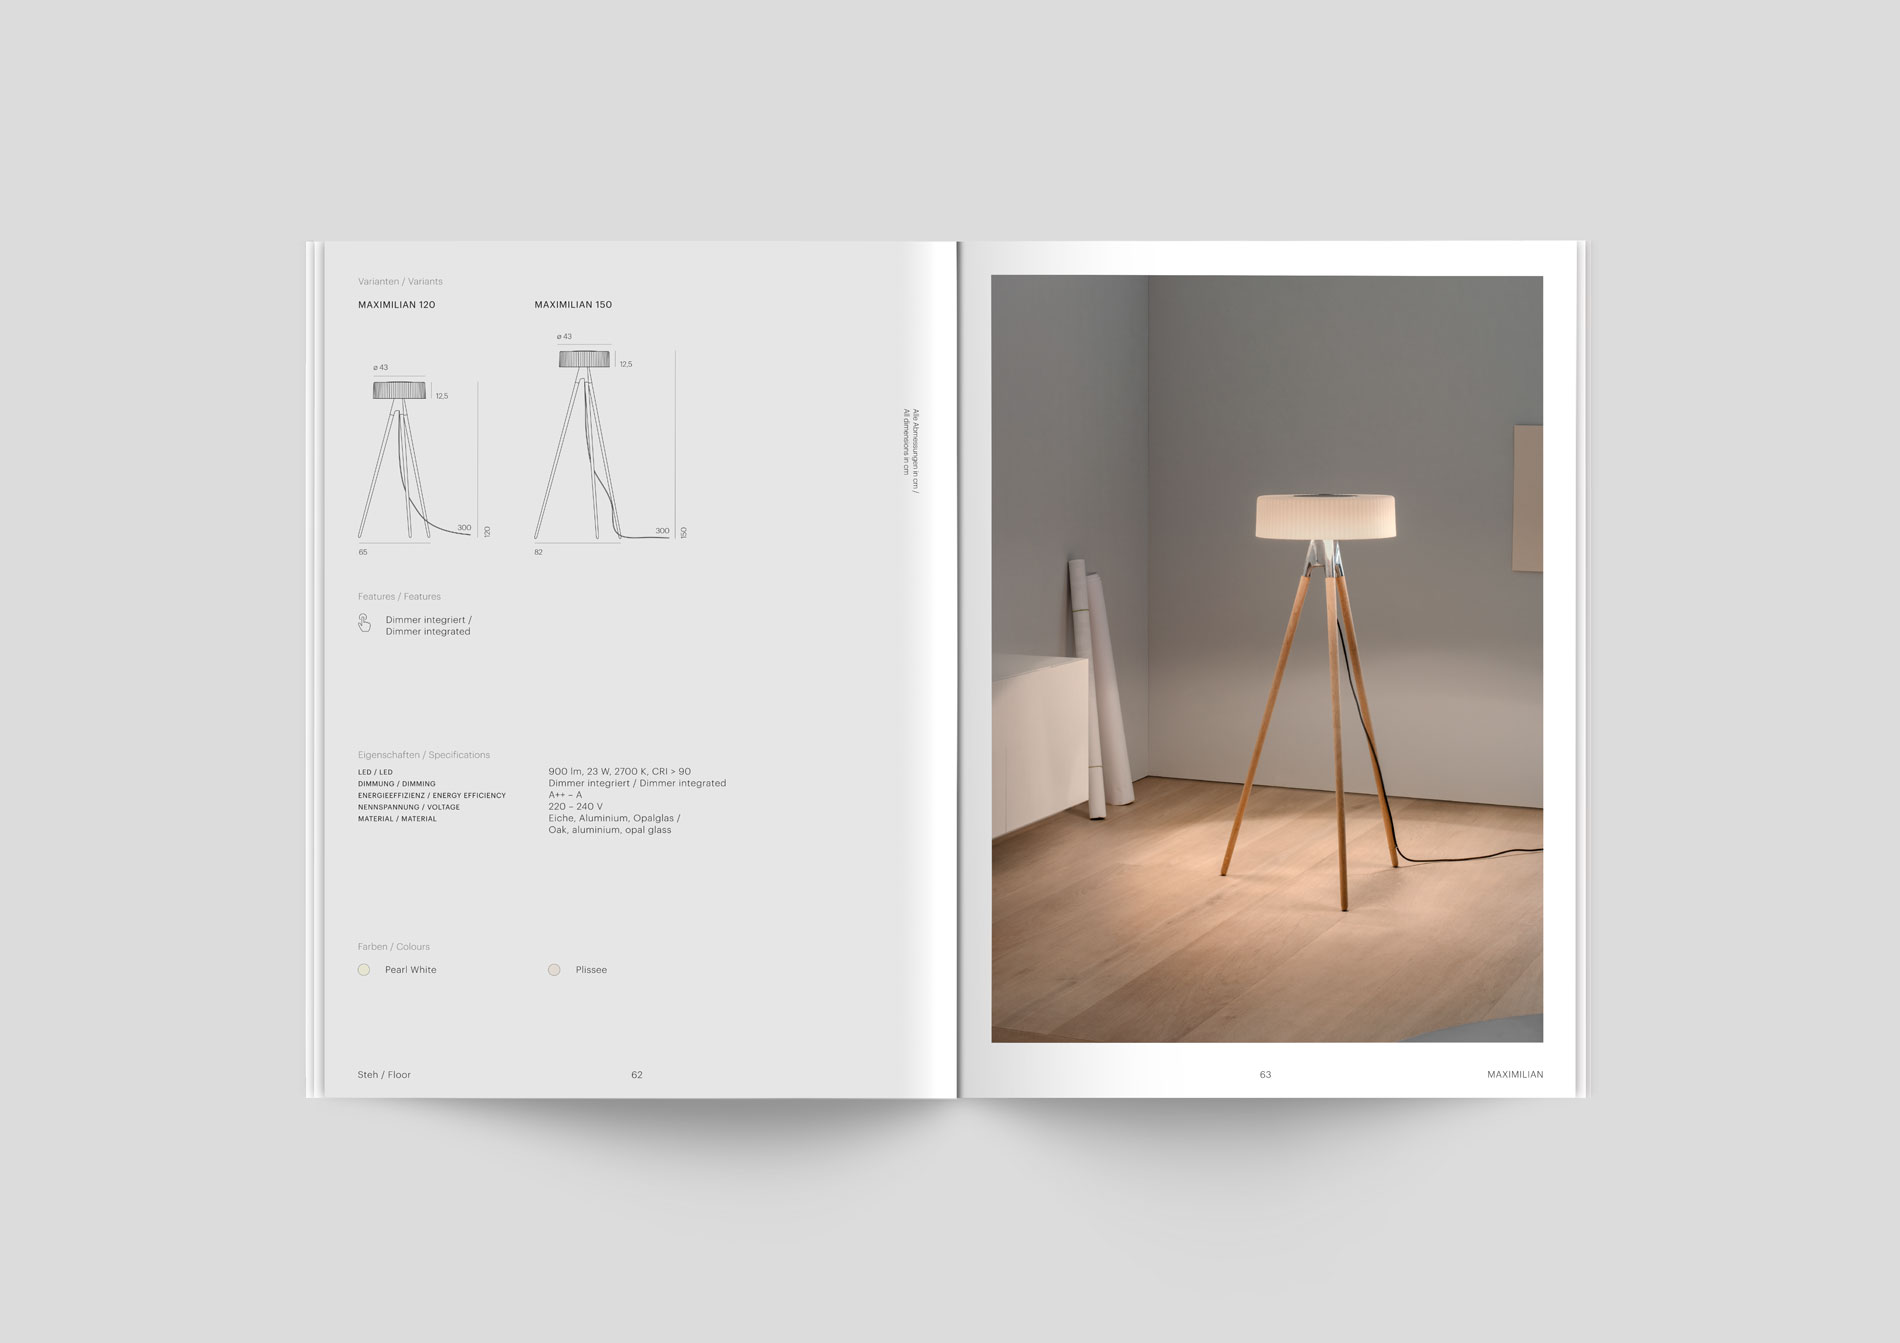 nicoletta-dalfino-tobias-grau-catalogue-2019-09